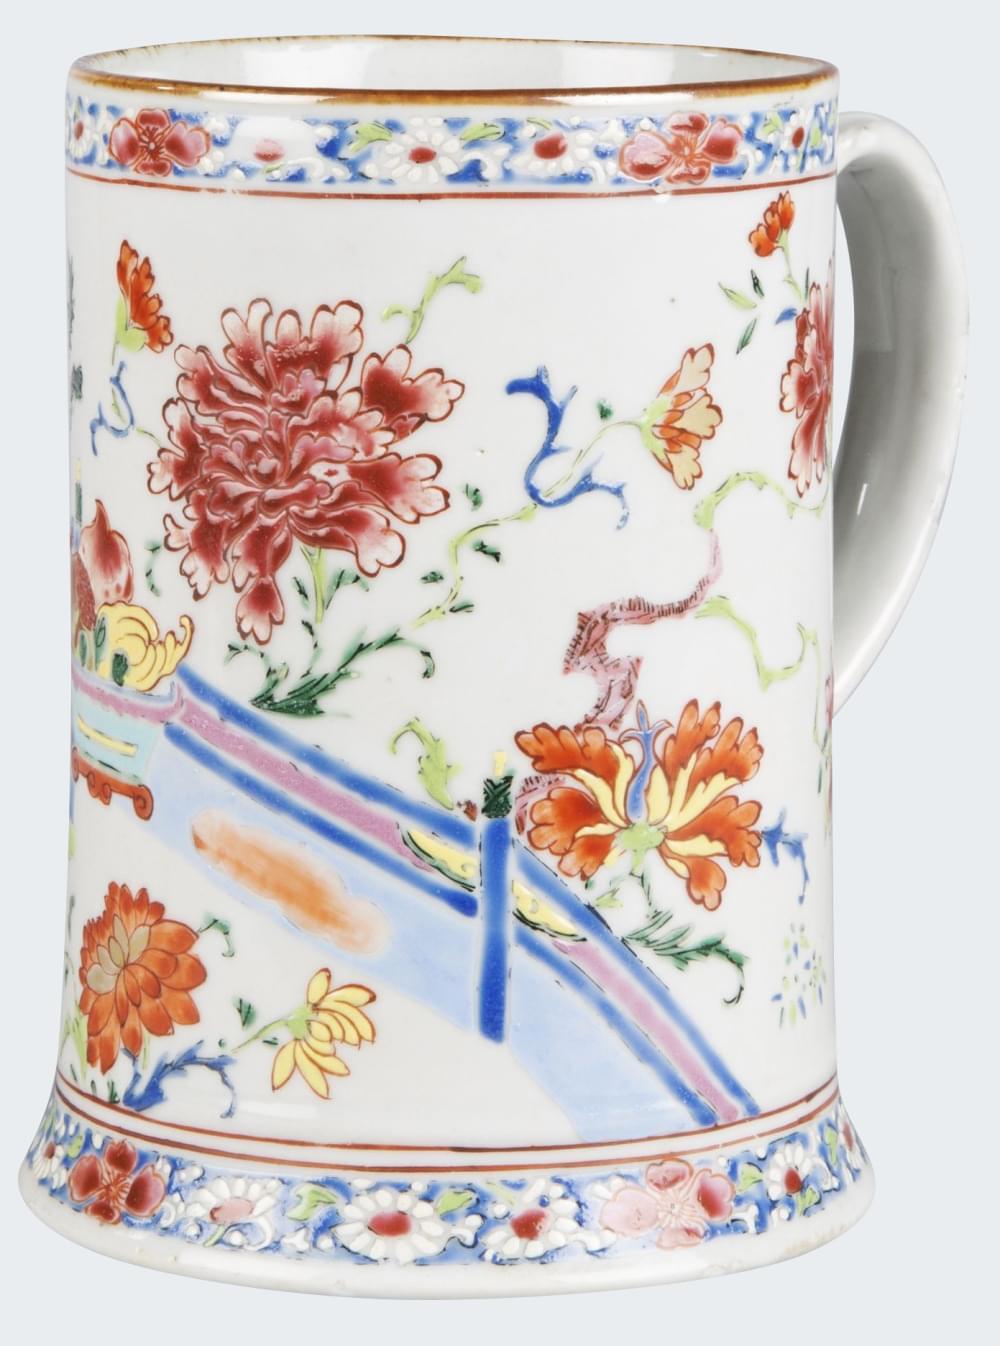 Famille rose Porcelain Yongzheng (1723 - 1735), China